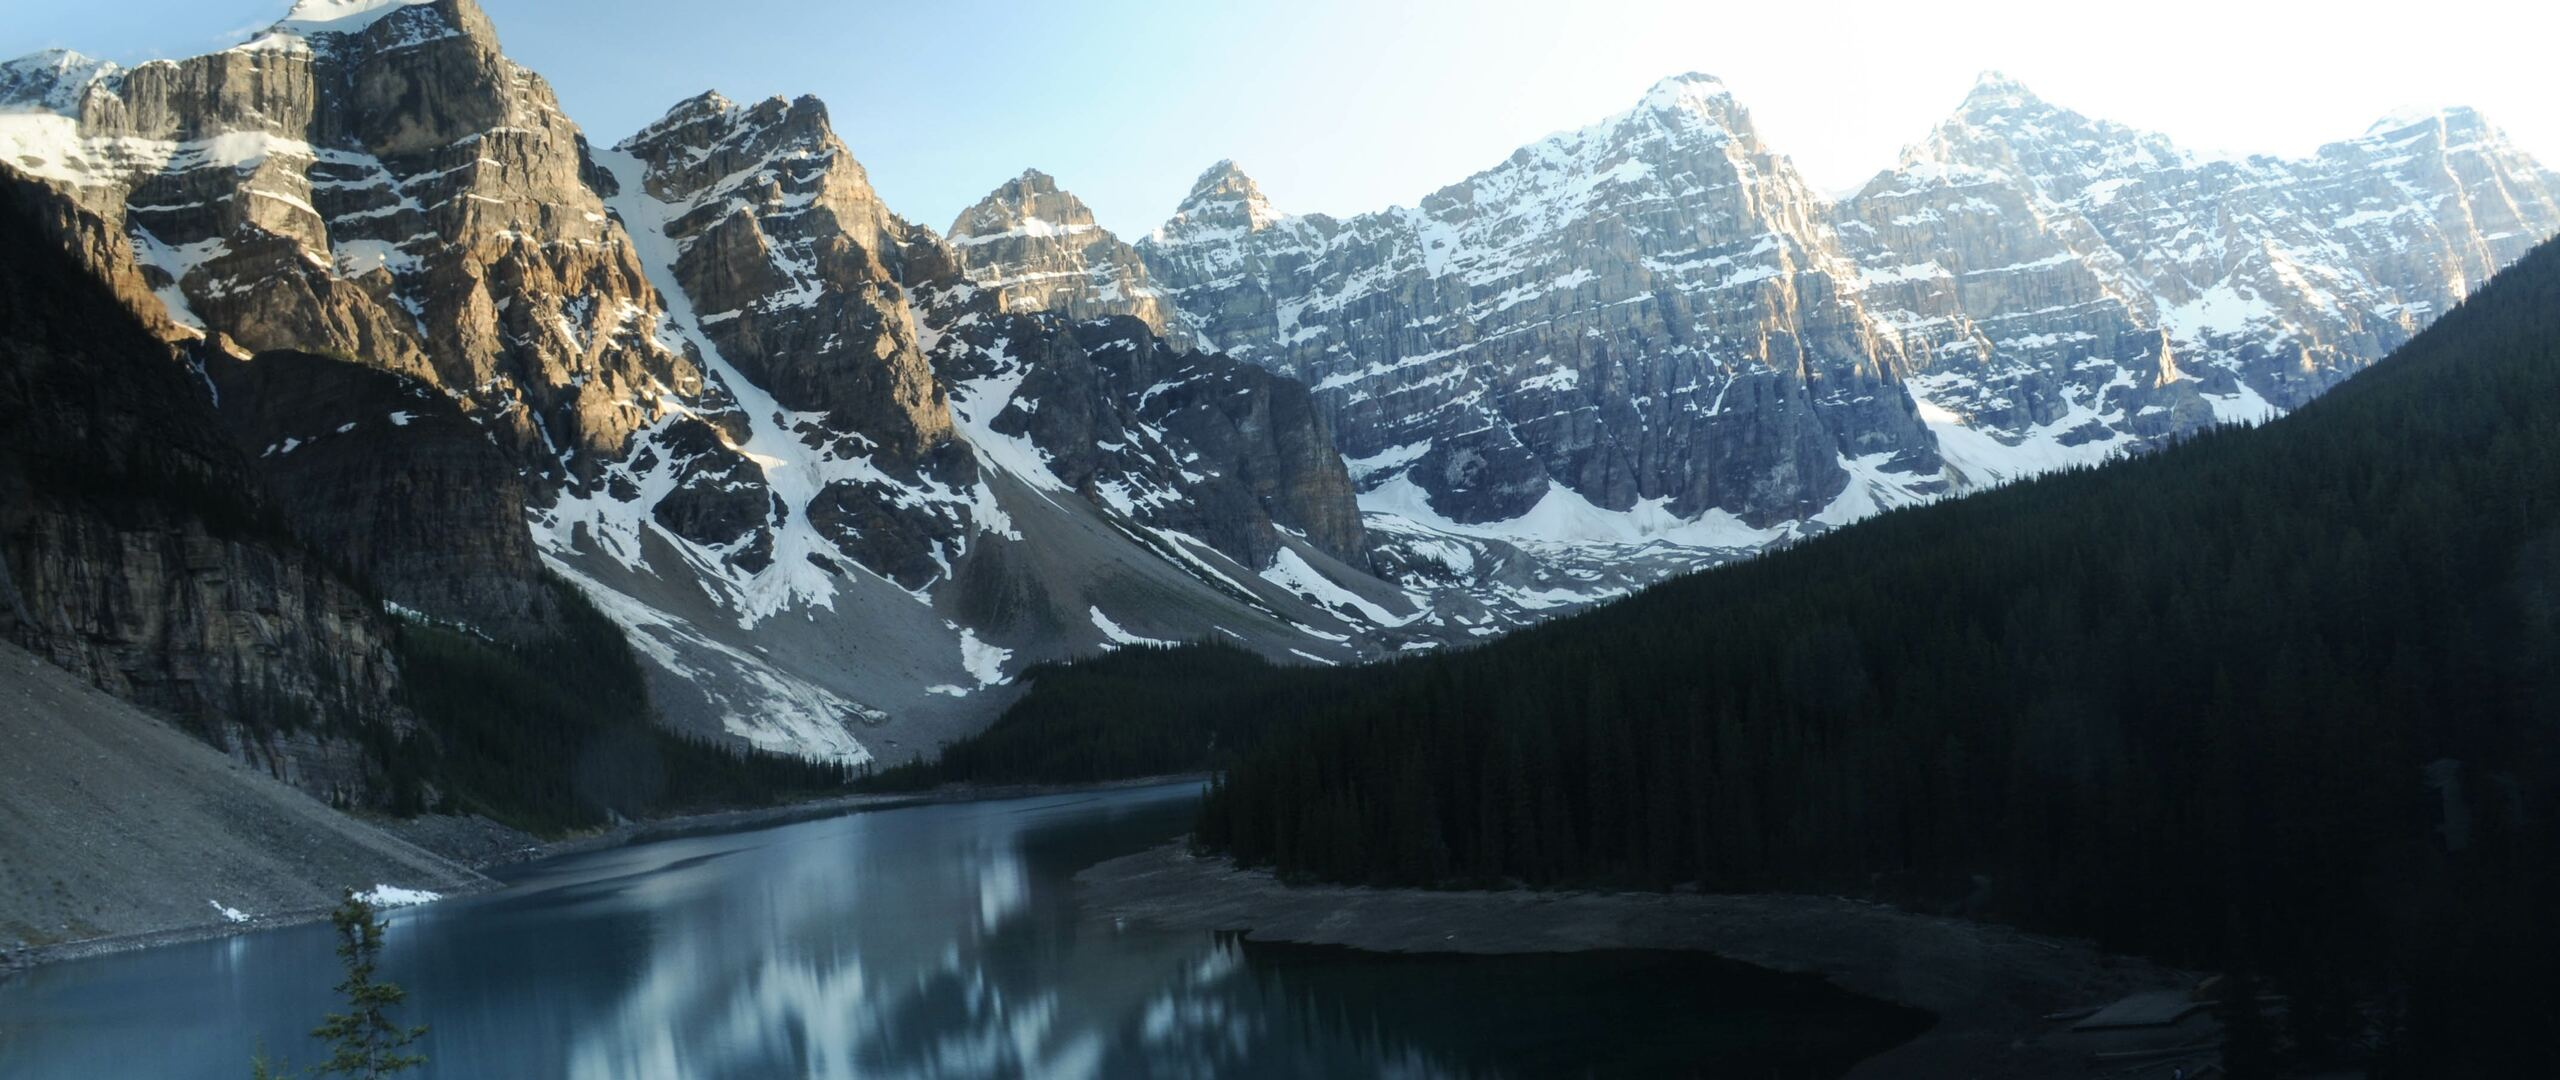 2560x1080 Moraine Lake Canada Reflections 5k 2560x1080